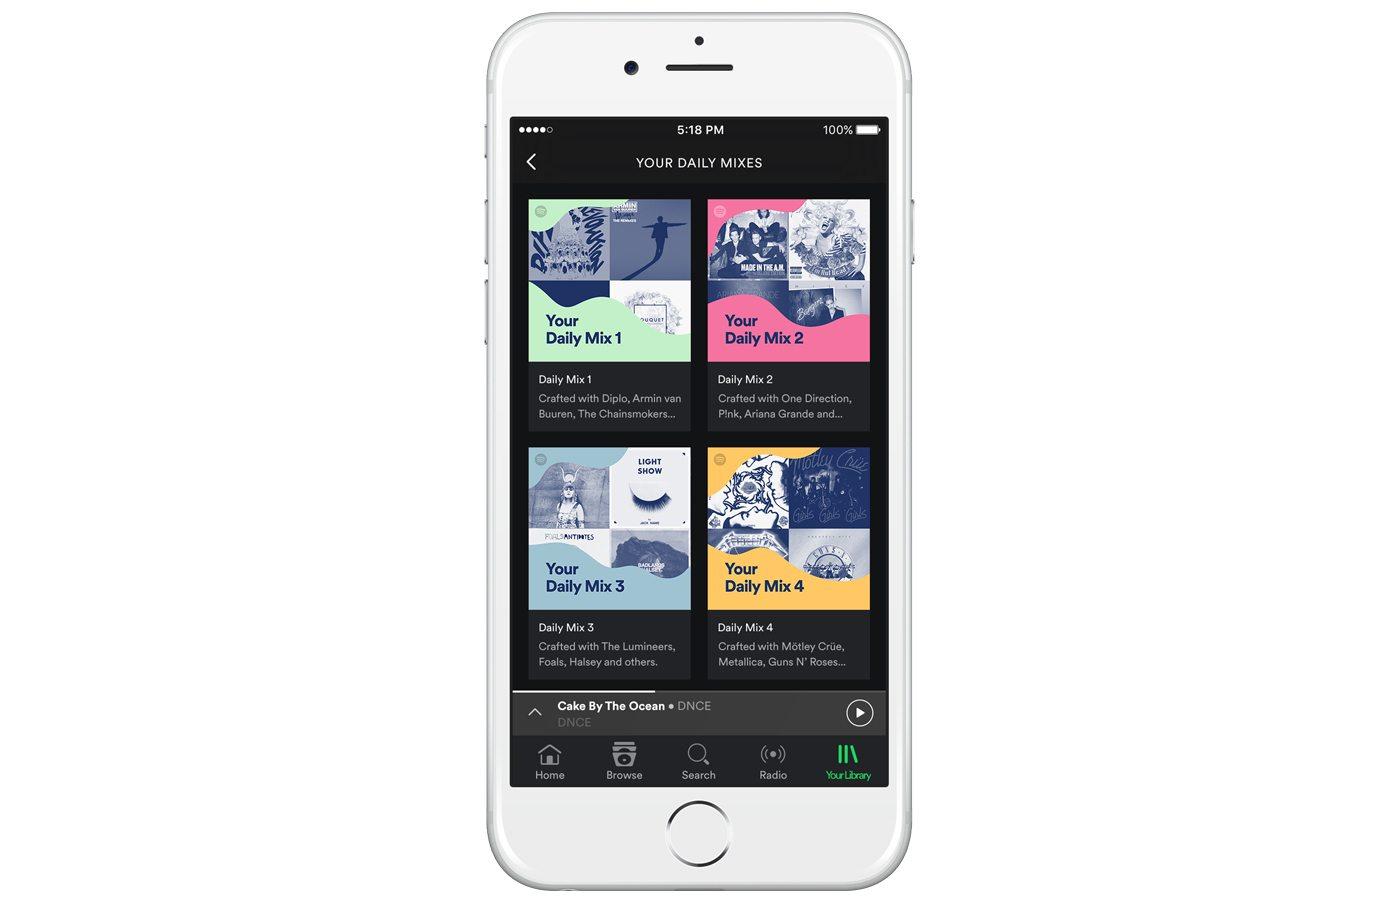 Spotify Daily Mix